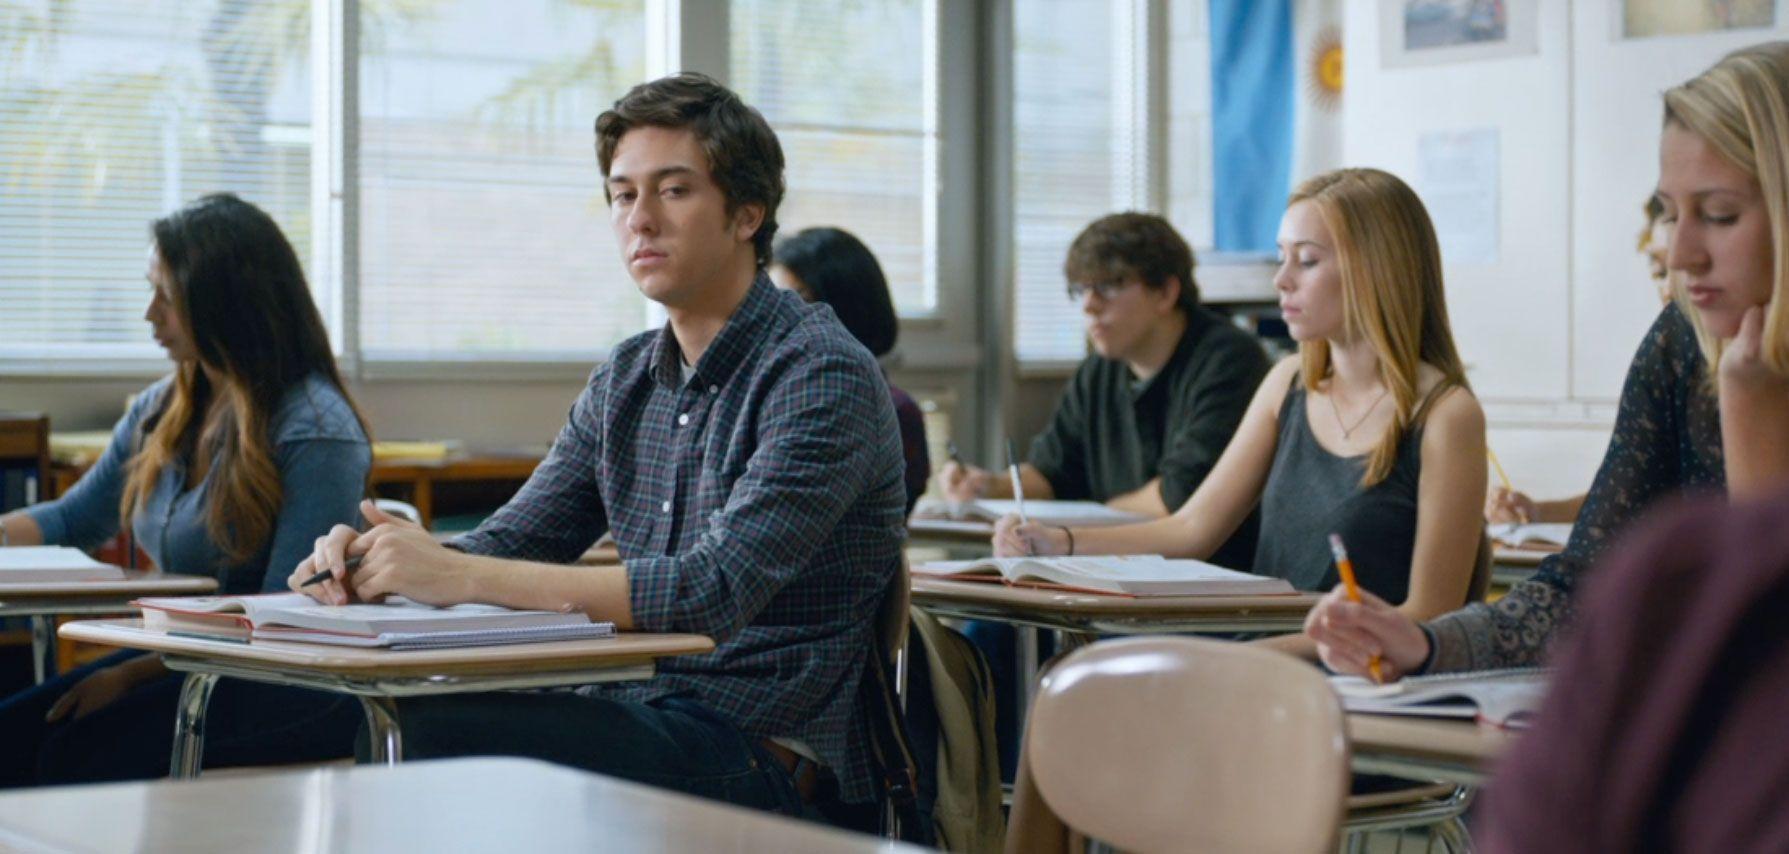 Death Note Movie Heads to Netflix After Warner Bros  Drops